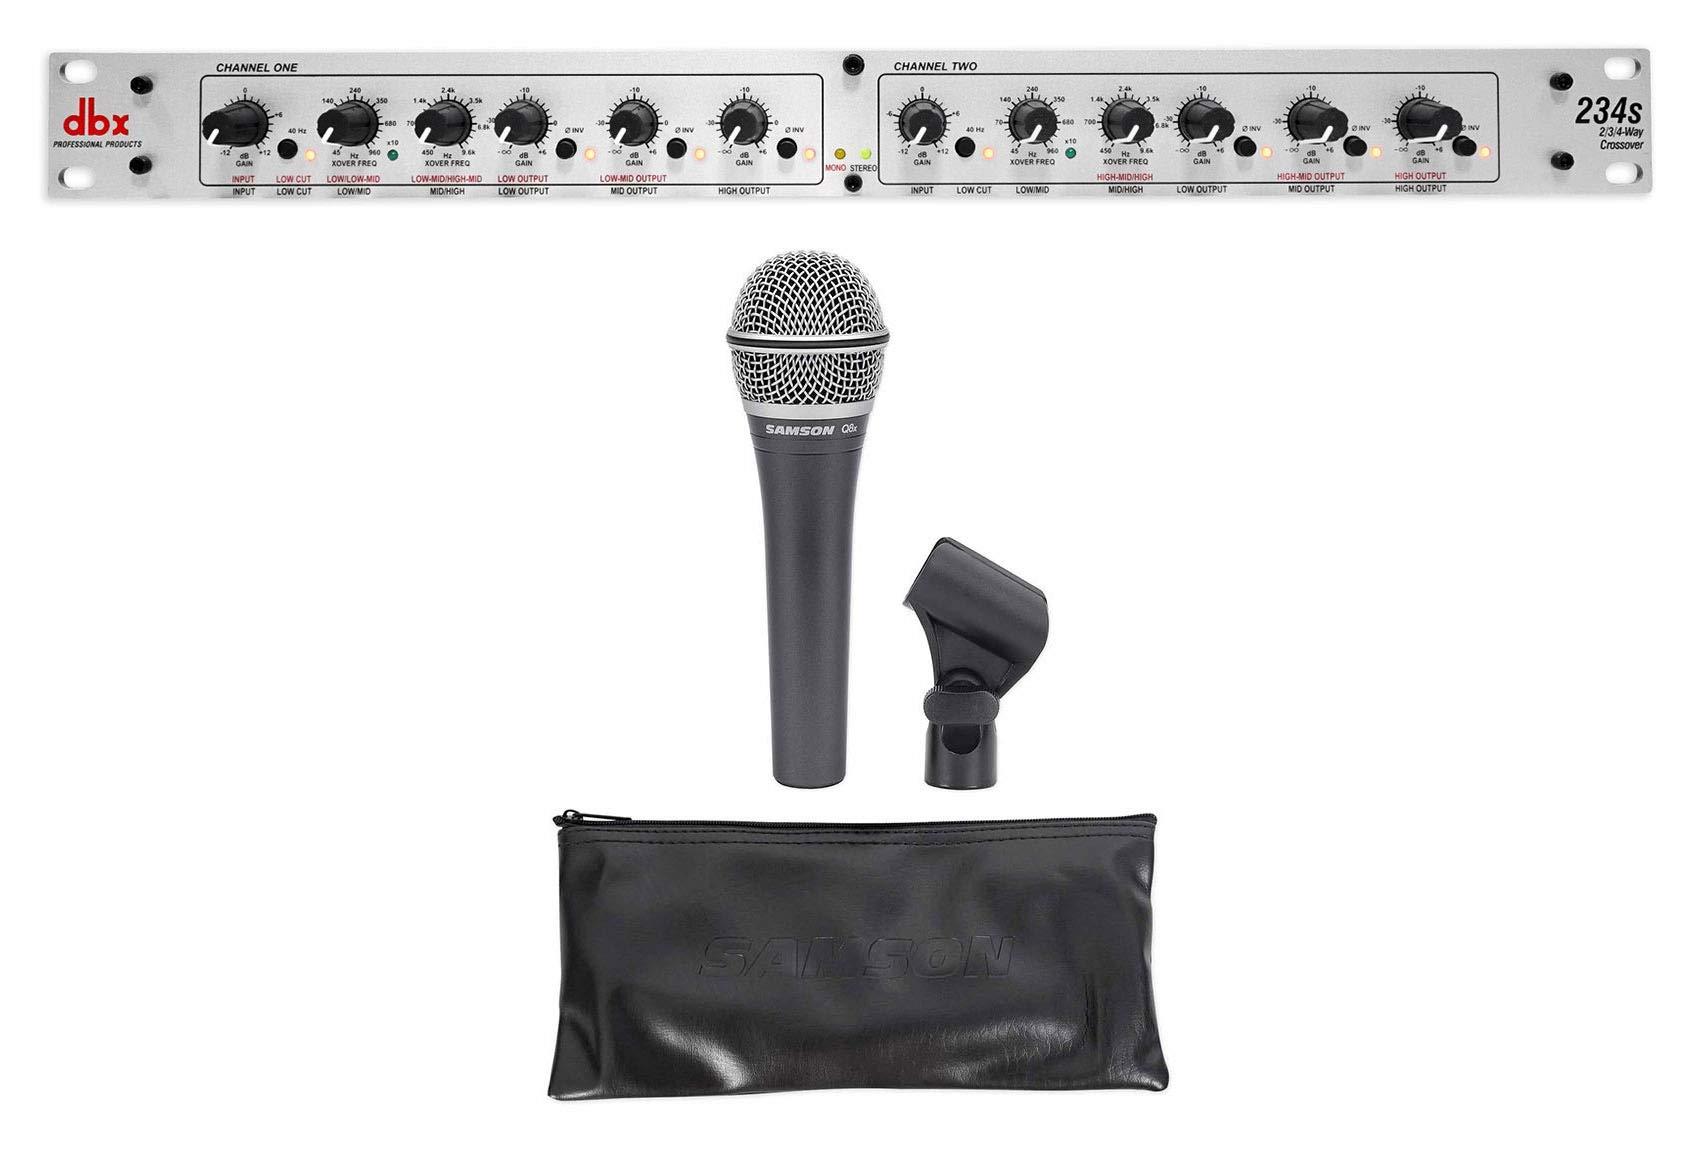 DBX 234S Stereo 2/3 Way/Mono 4-Way Crossover+Samson Microphone+Mic Clip